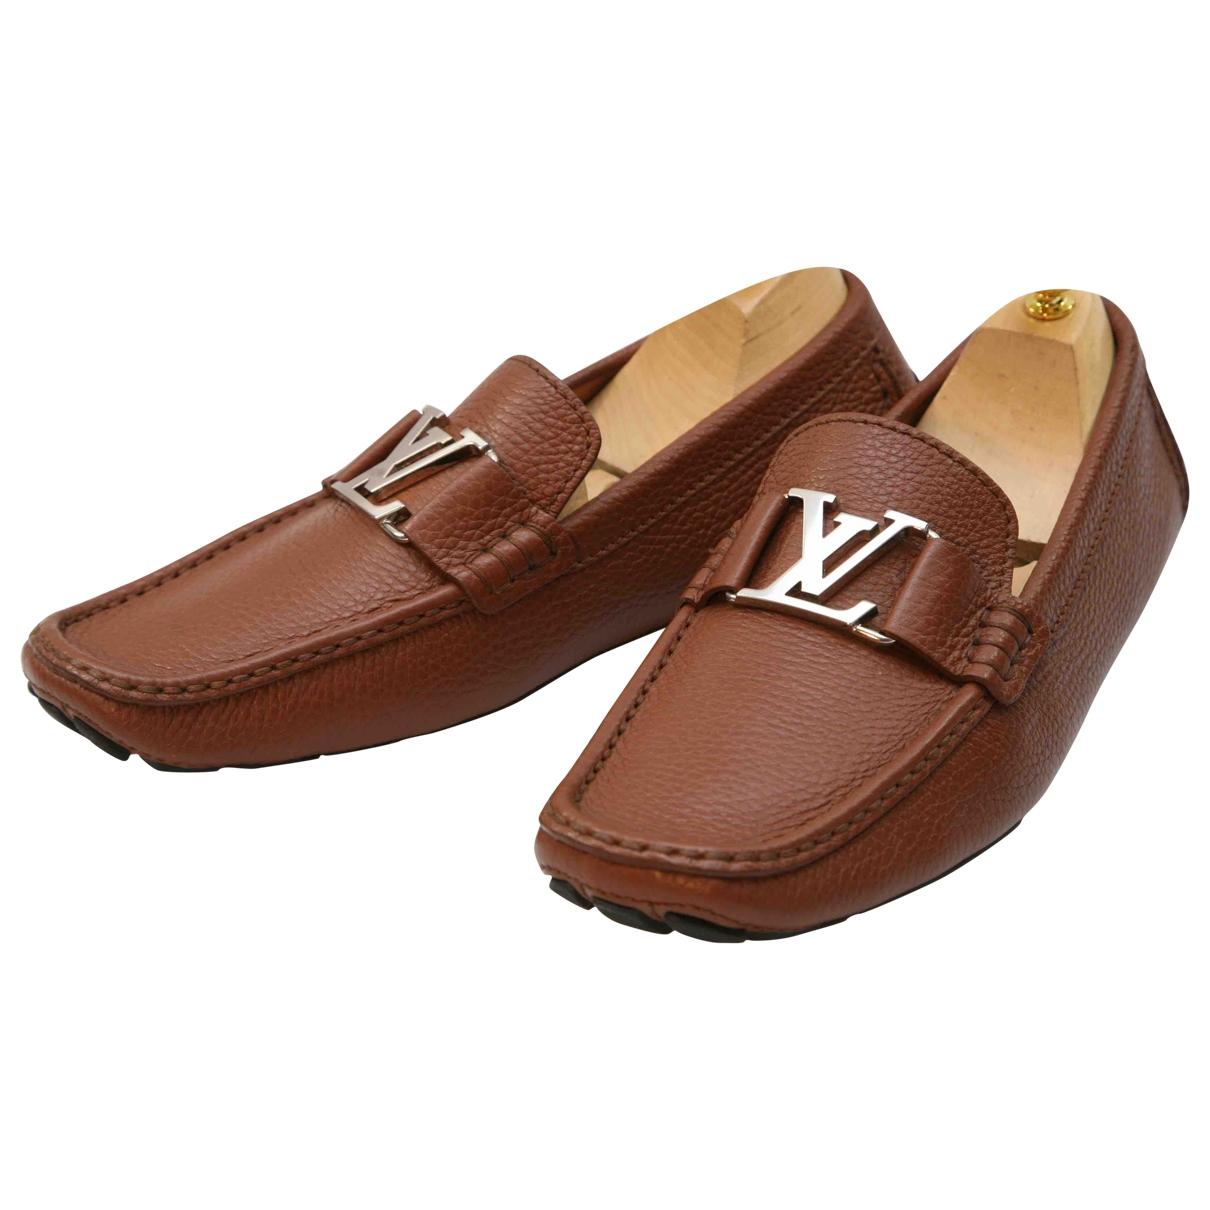 Louis Vuitton Hockenheim Brown Leather Flats for Men 7.5 UK